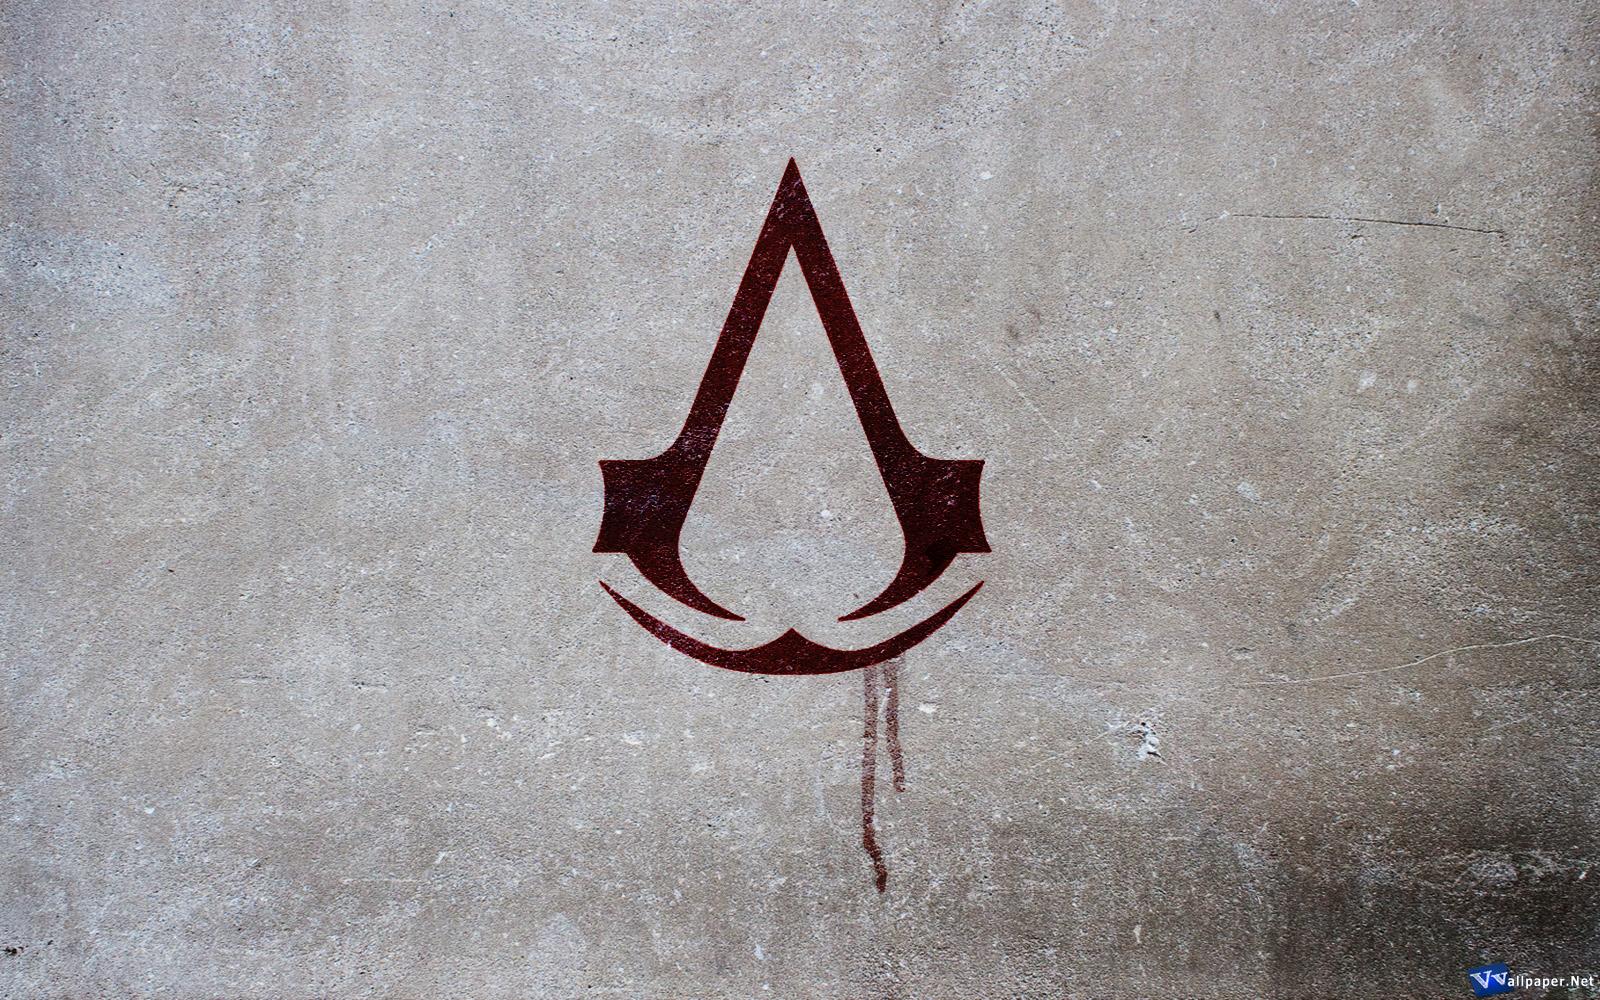 http://3.bp.blogspot.com/-U5yivCVnaqM/Too8aFF45EI/AAAAAAAADV4/VYC-8aEPtlQ/s1600/Assassin%2527s_Creed_Symbol_HD_Wallpaper_GameWallBase.com.jpg.jpg